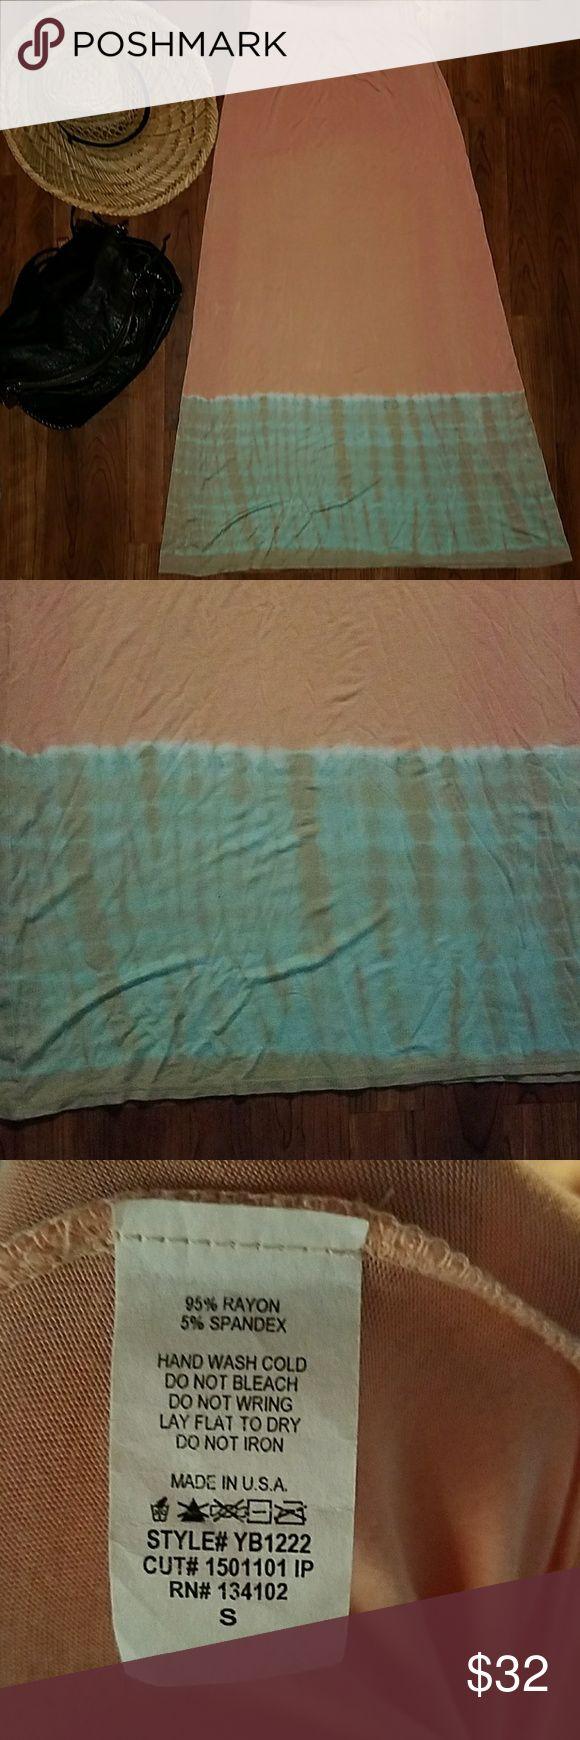 NEW♥Tie Dye Maxi Skirt Peach & Tiffany Blue/Small Brand New without Tags  Peach to Tiffany Blue  Size Small  Elastic waistband USA Skirts Maxi